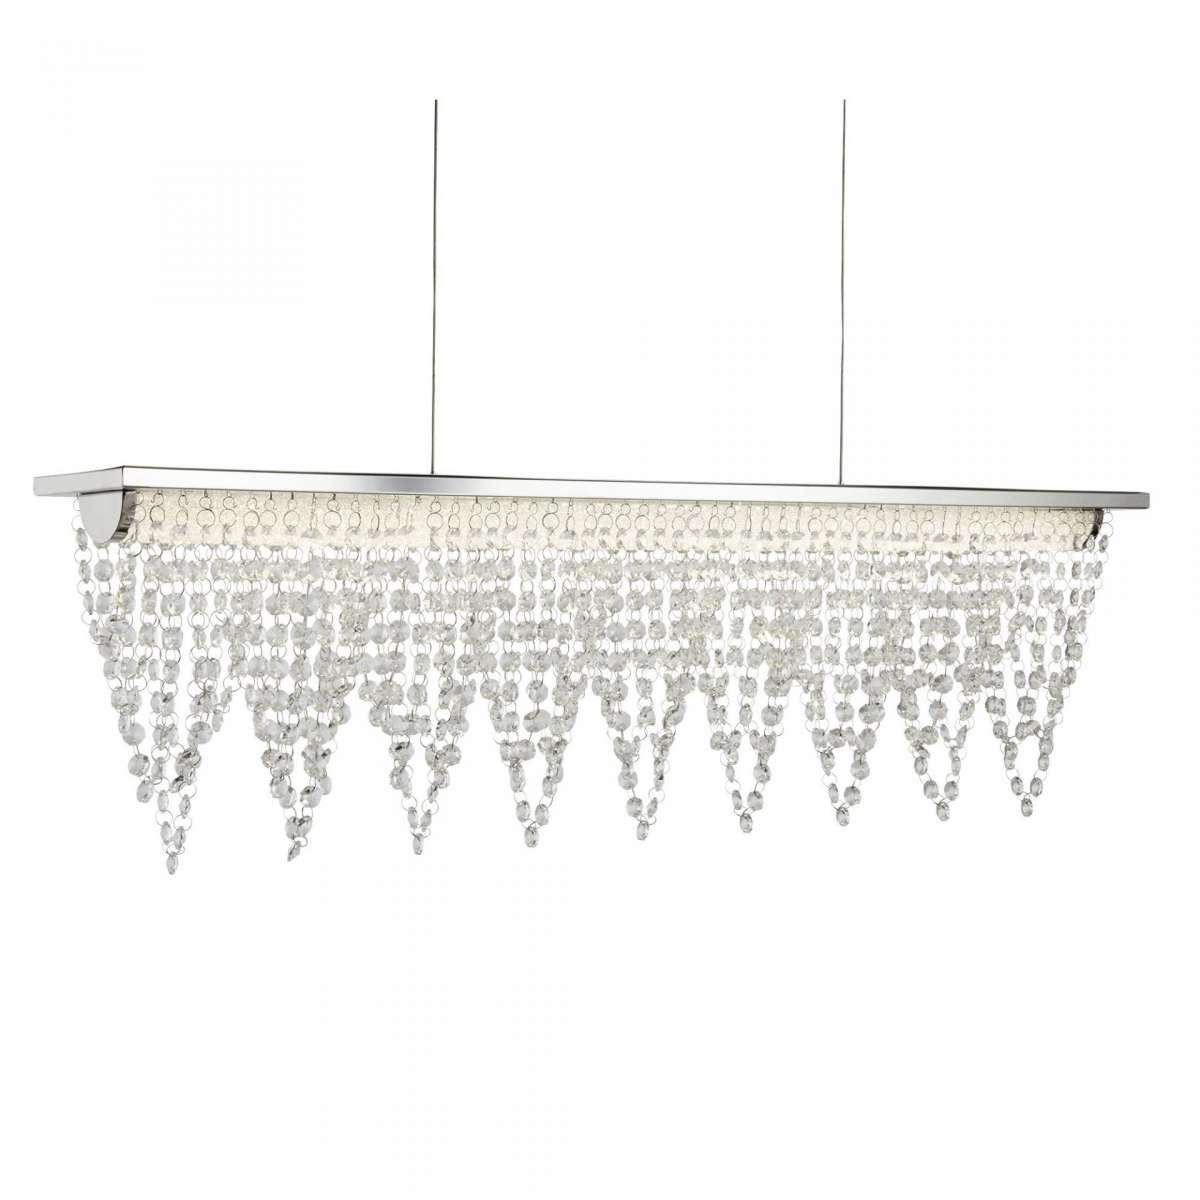 8857CC Drape LED Ceiling Bar Crystal Waterfall Dressing